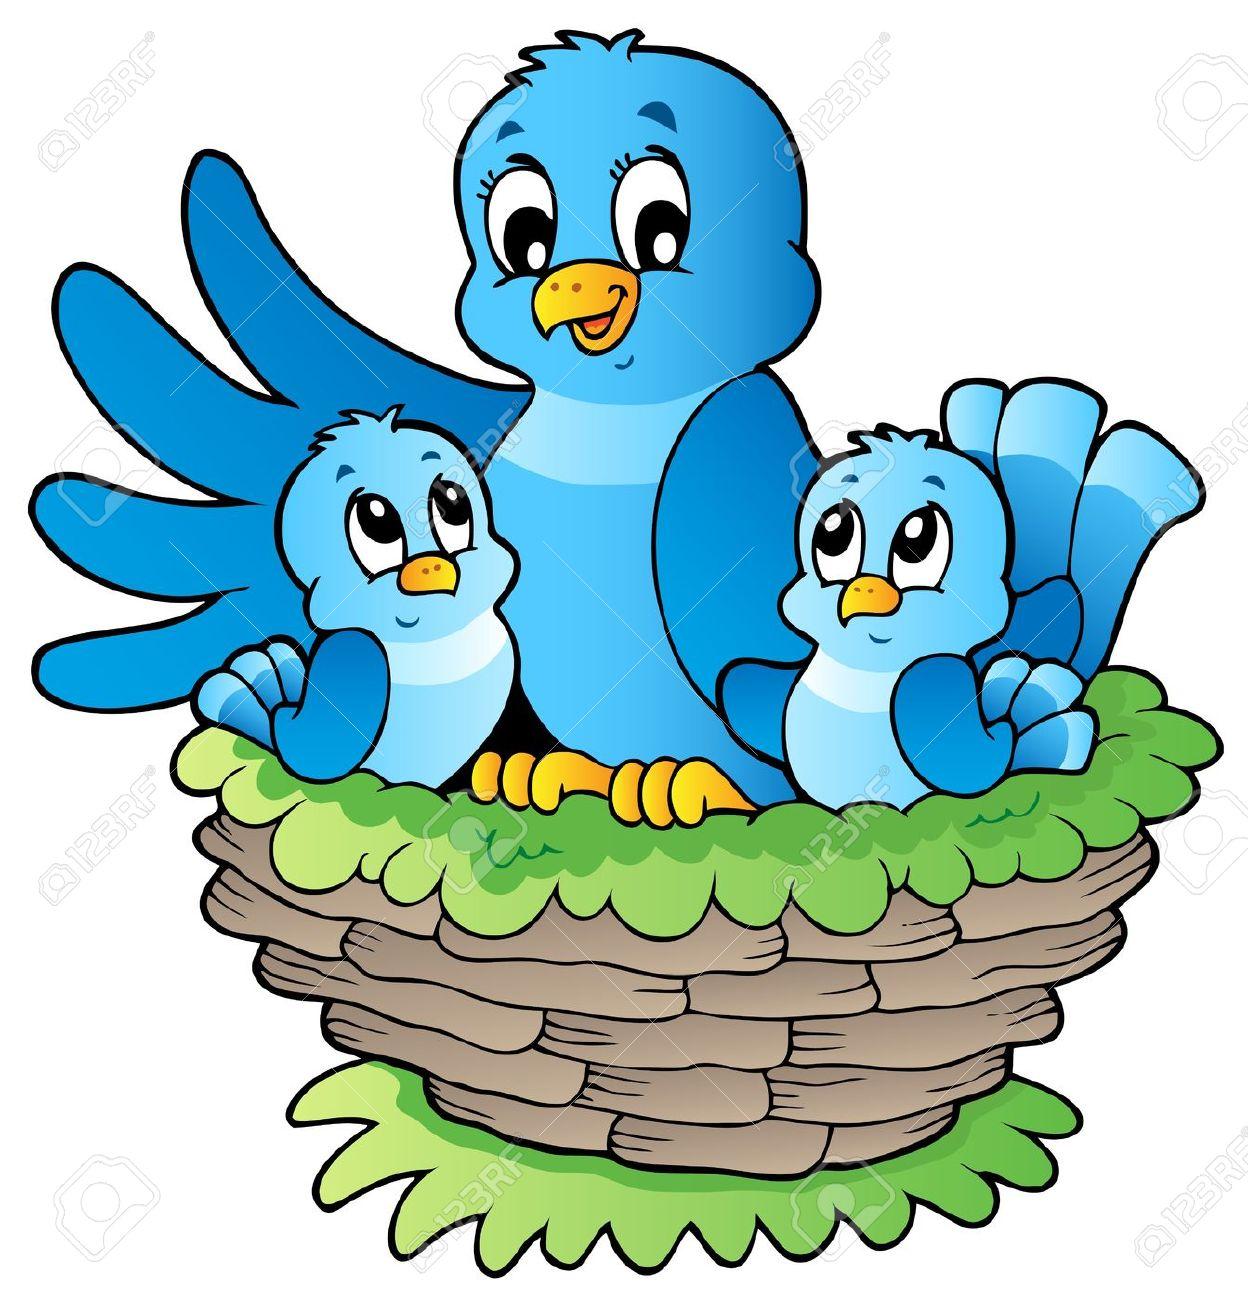 Nest clipart mother bird. Cartoon free download best